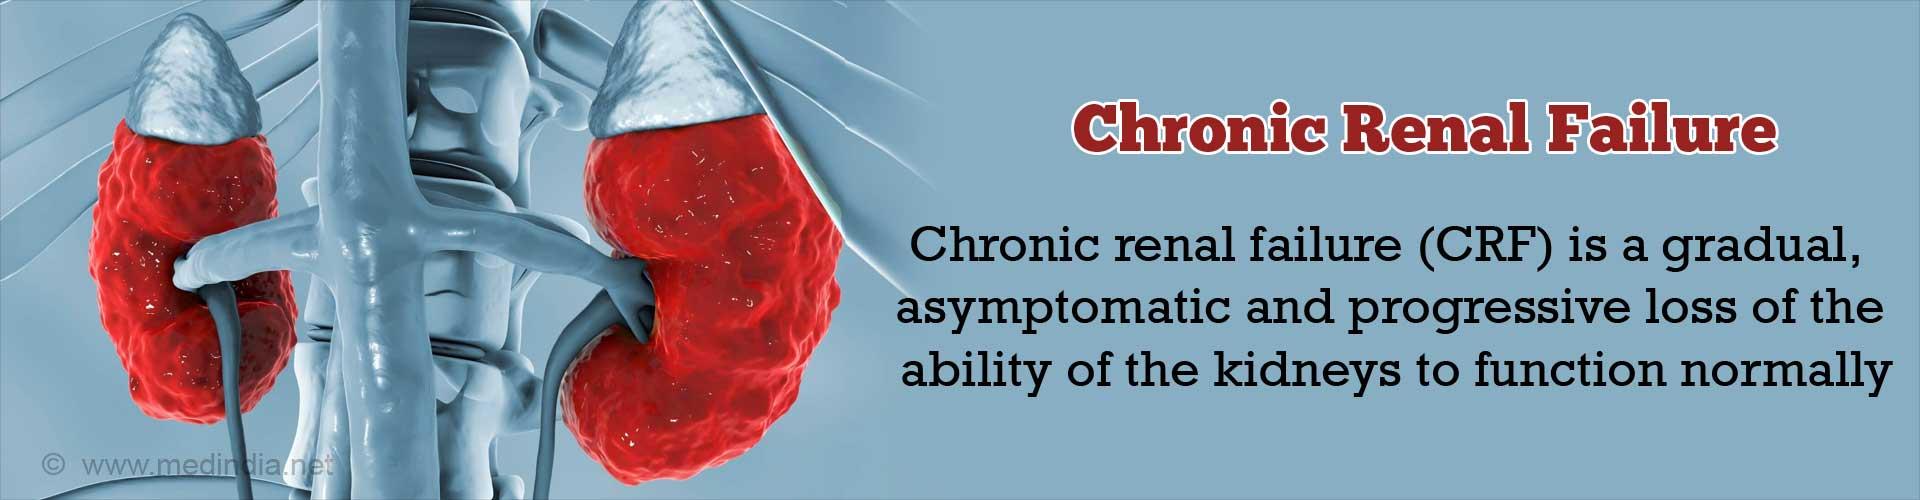 Chronic Renal Failure (CRF)